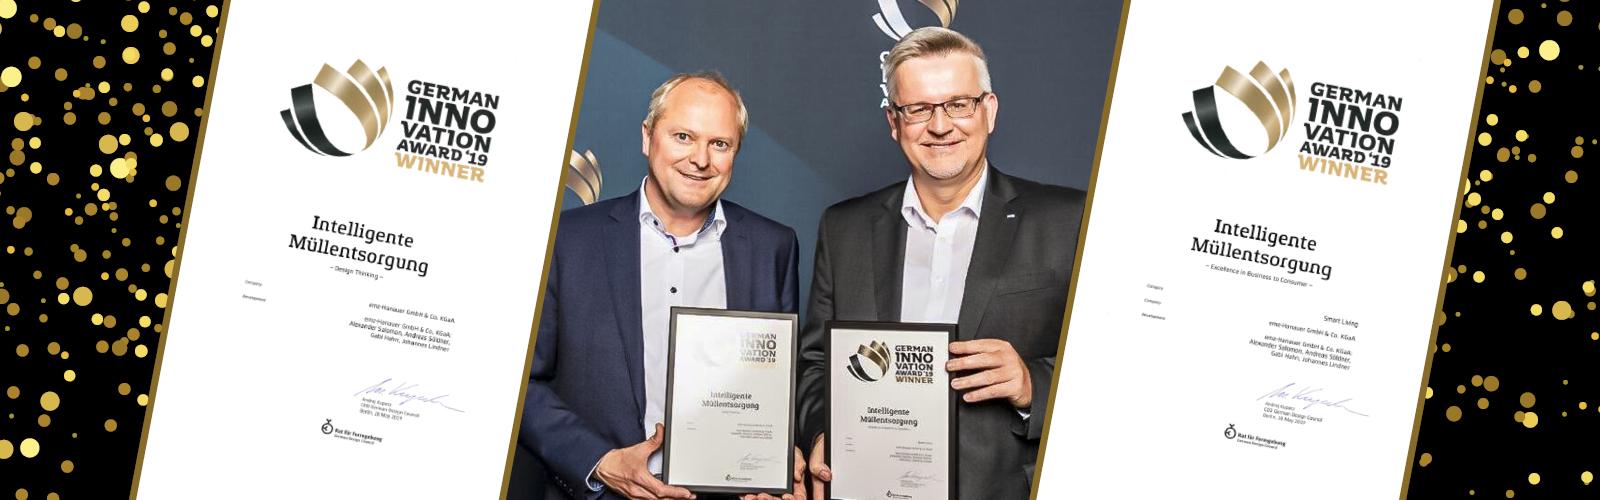 egate digi gewinnt German Innovation Award 2019